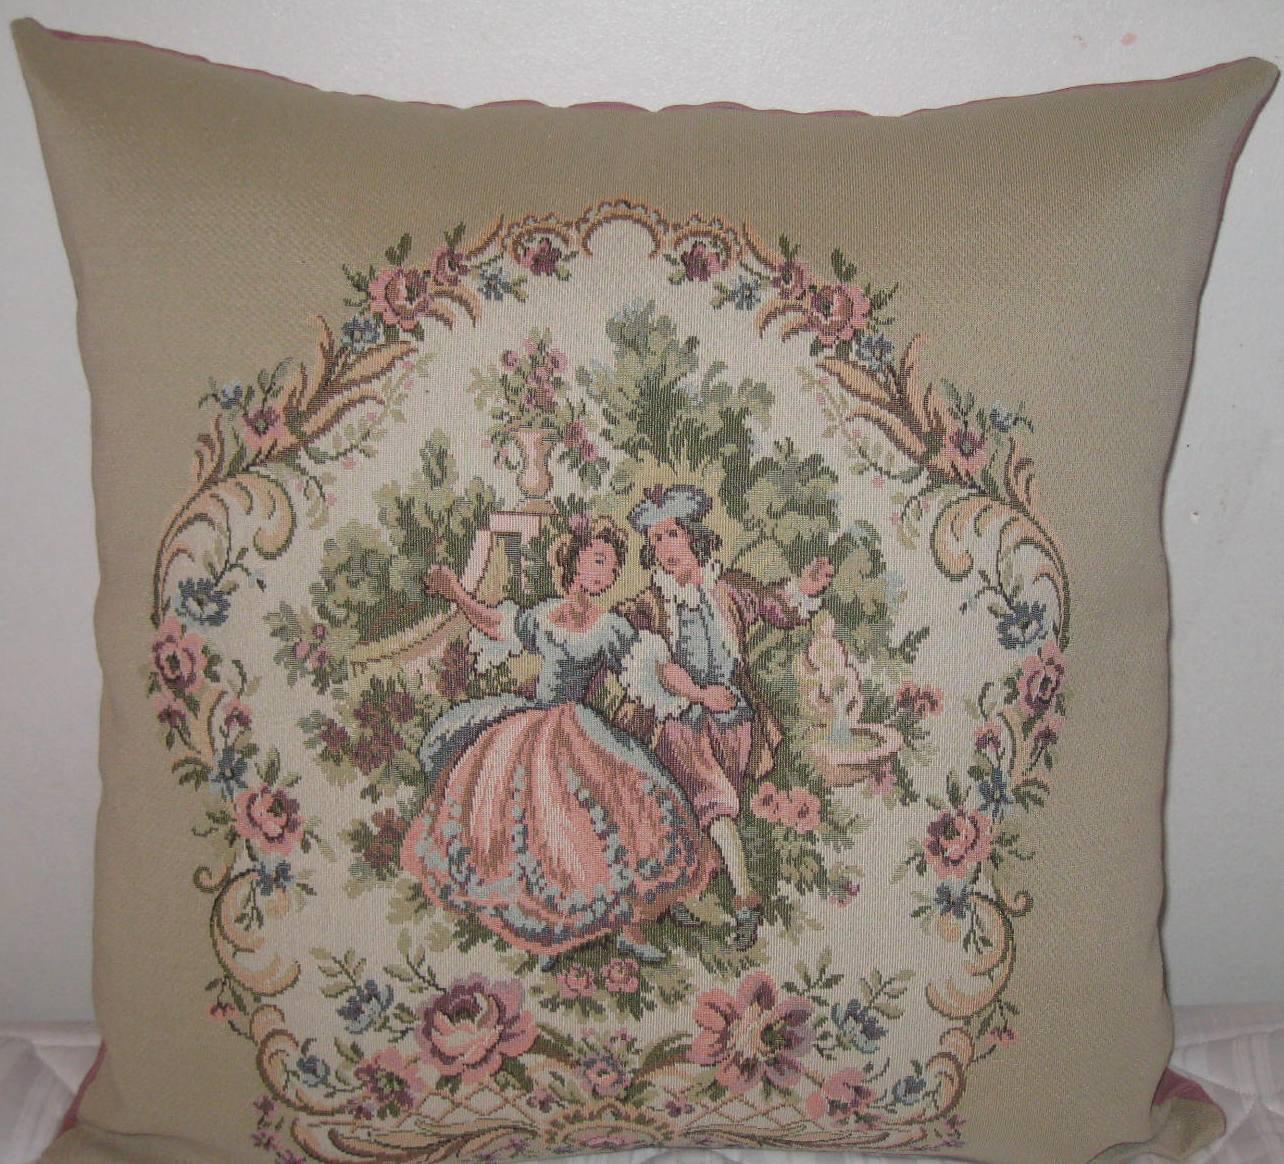 Victoria pattern decorative pillow cover-20x20